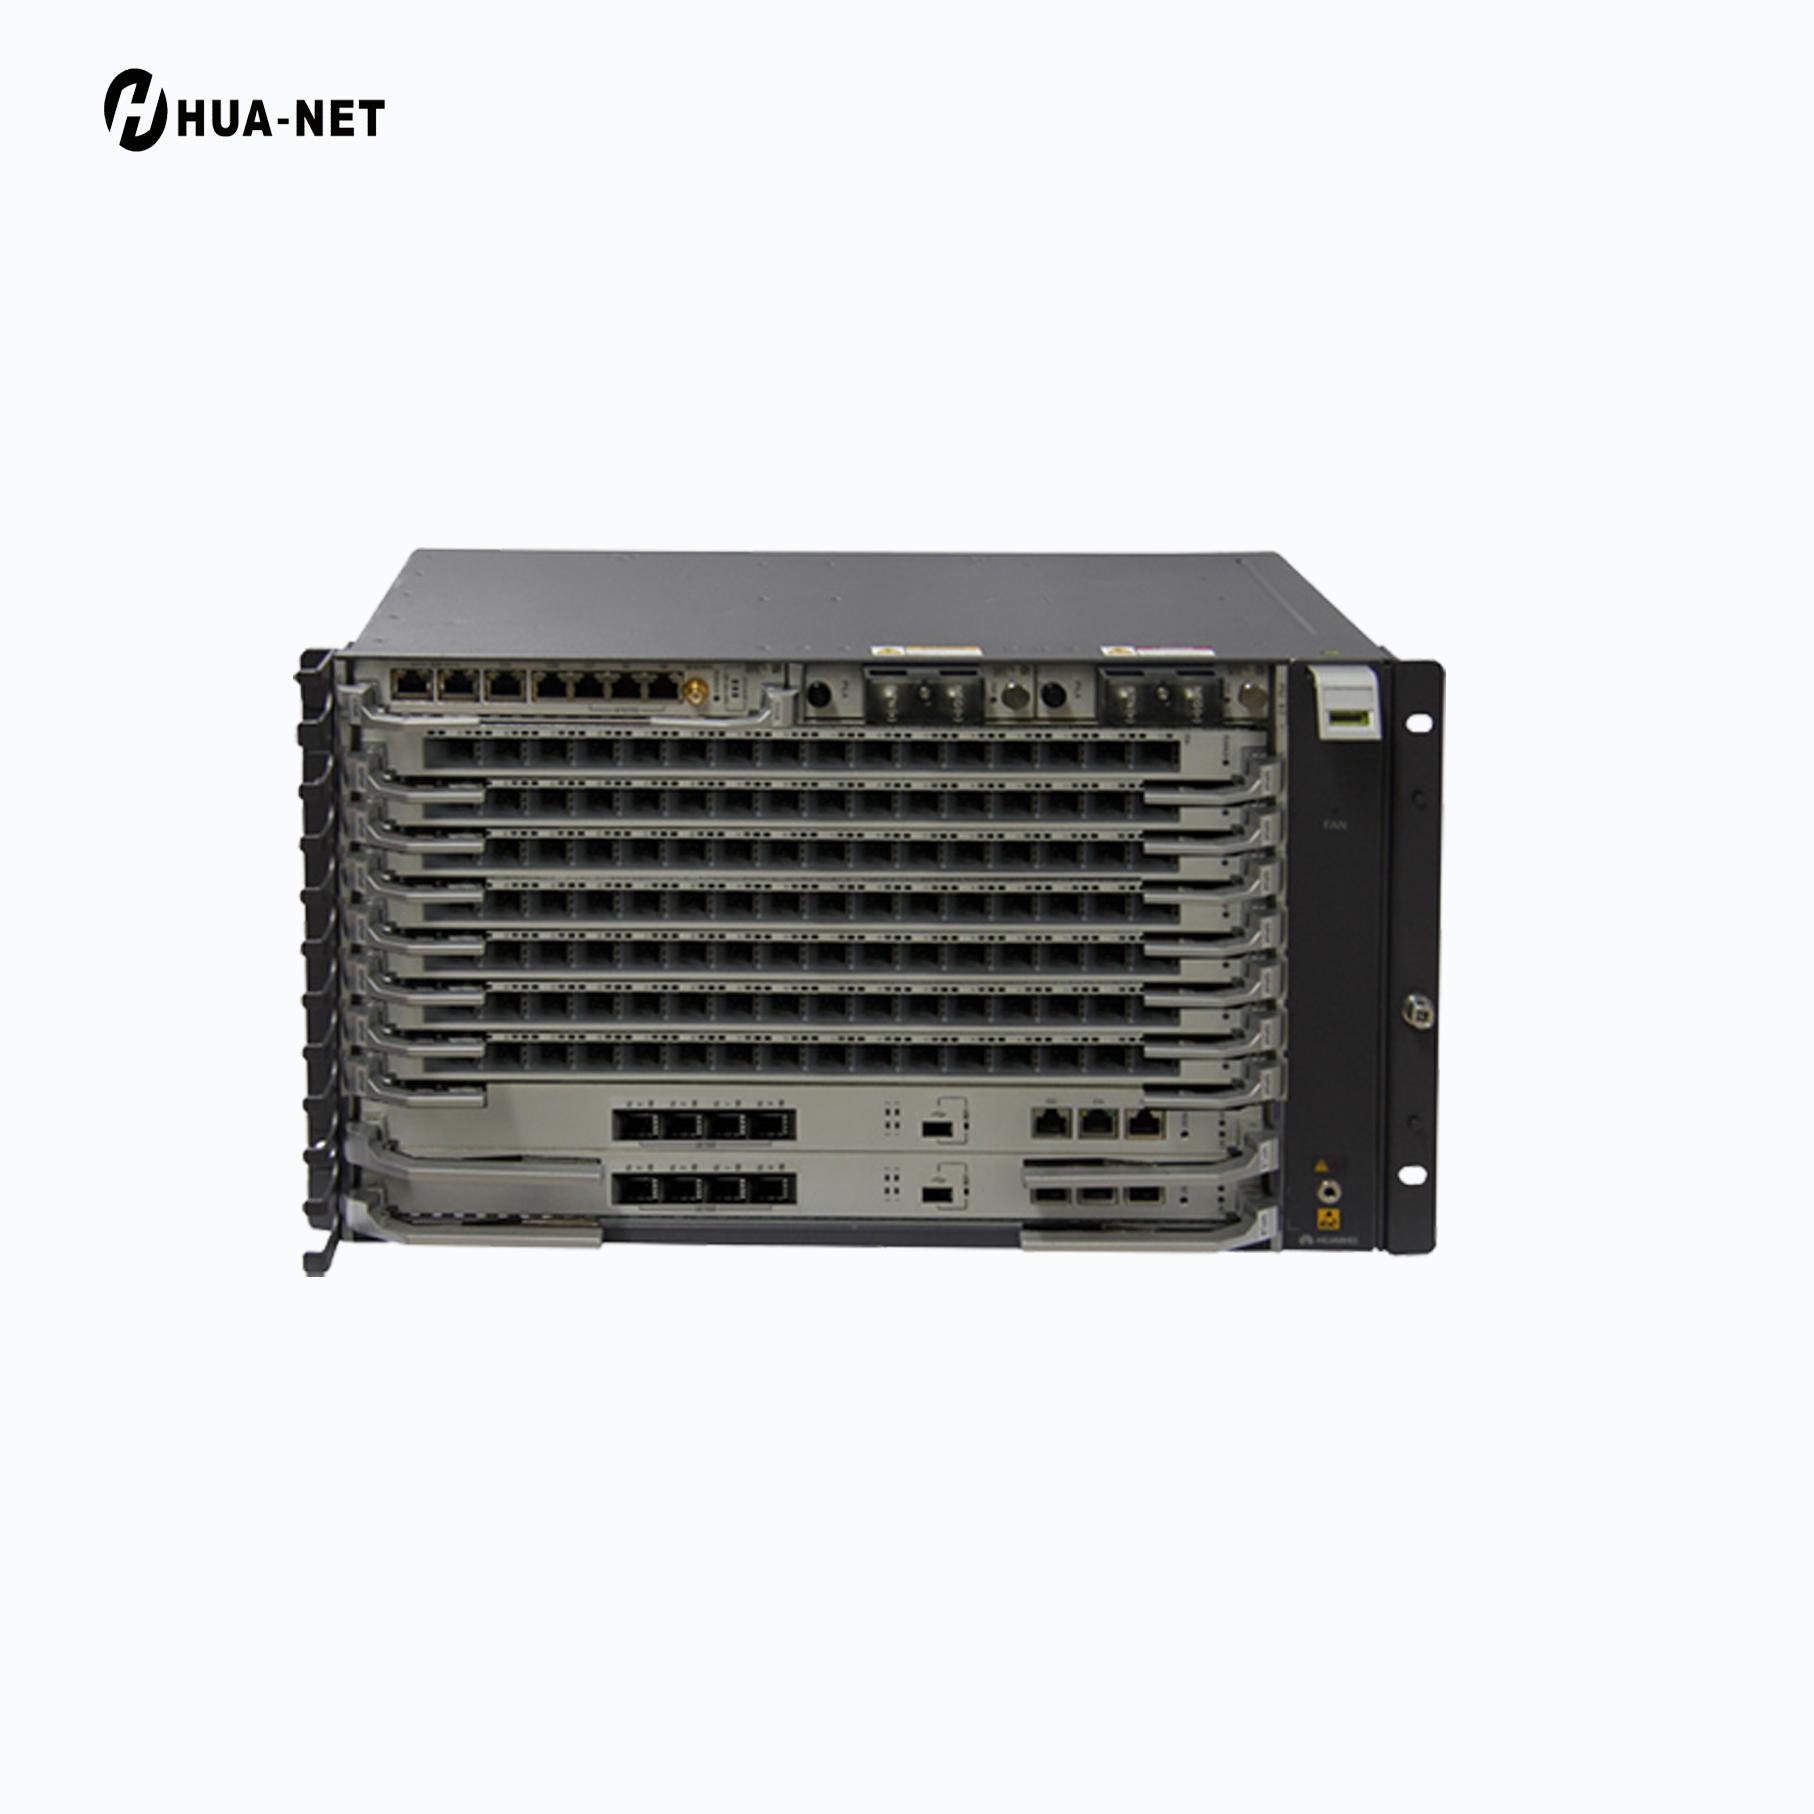 16 Ports For Sale Hua Wei Olt Ma5800-x7 Ma5800-x17 Ma5800-x2 16-piece Gpon Board Sfp C New And Original Gphf C